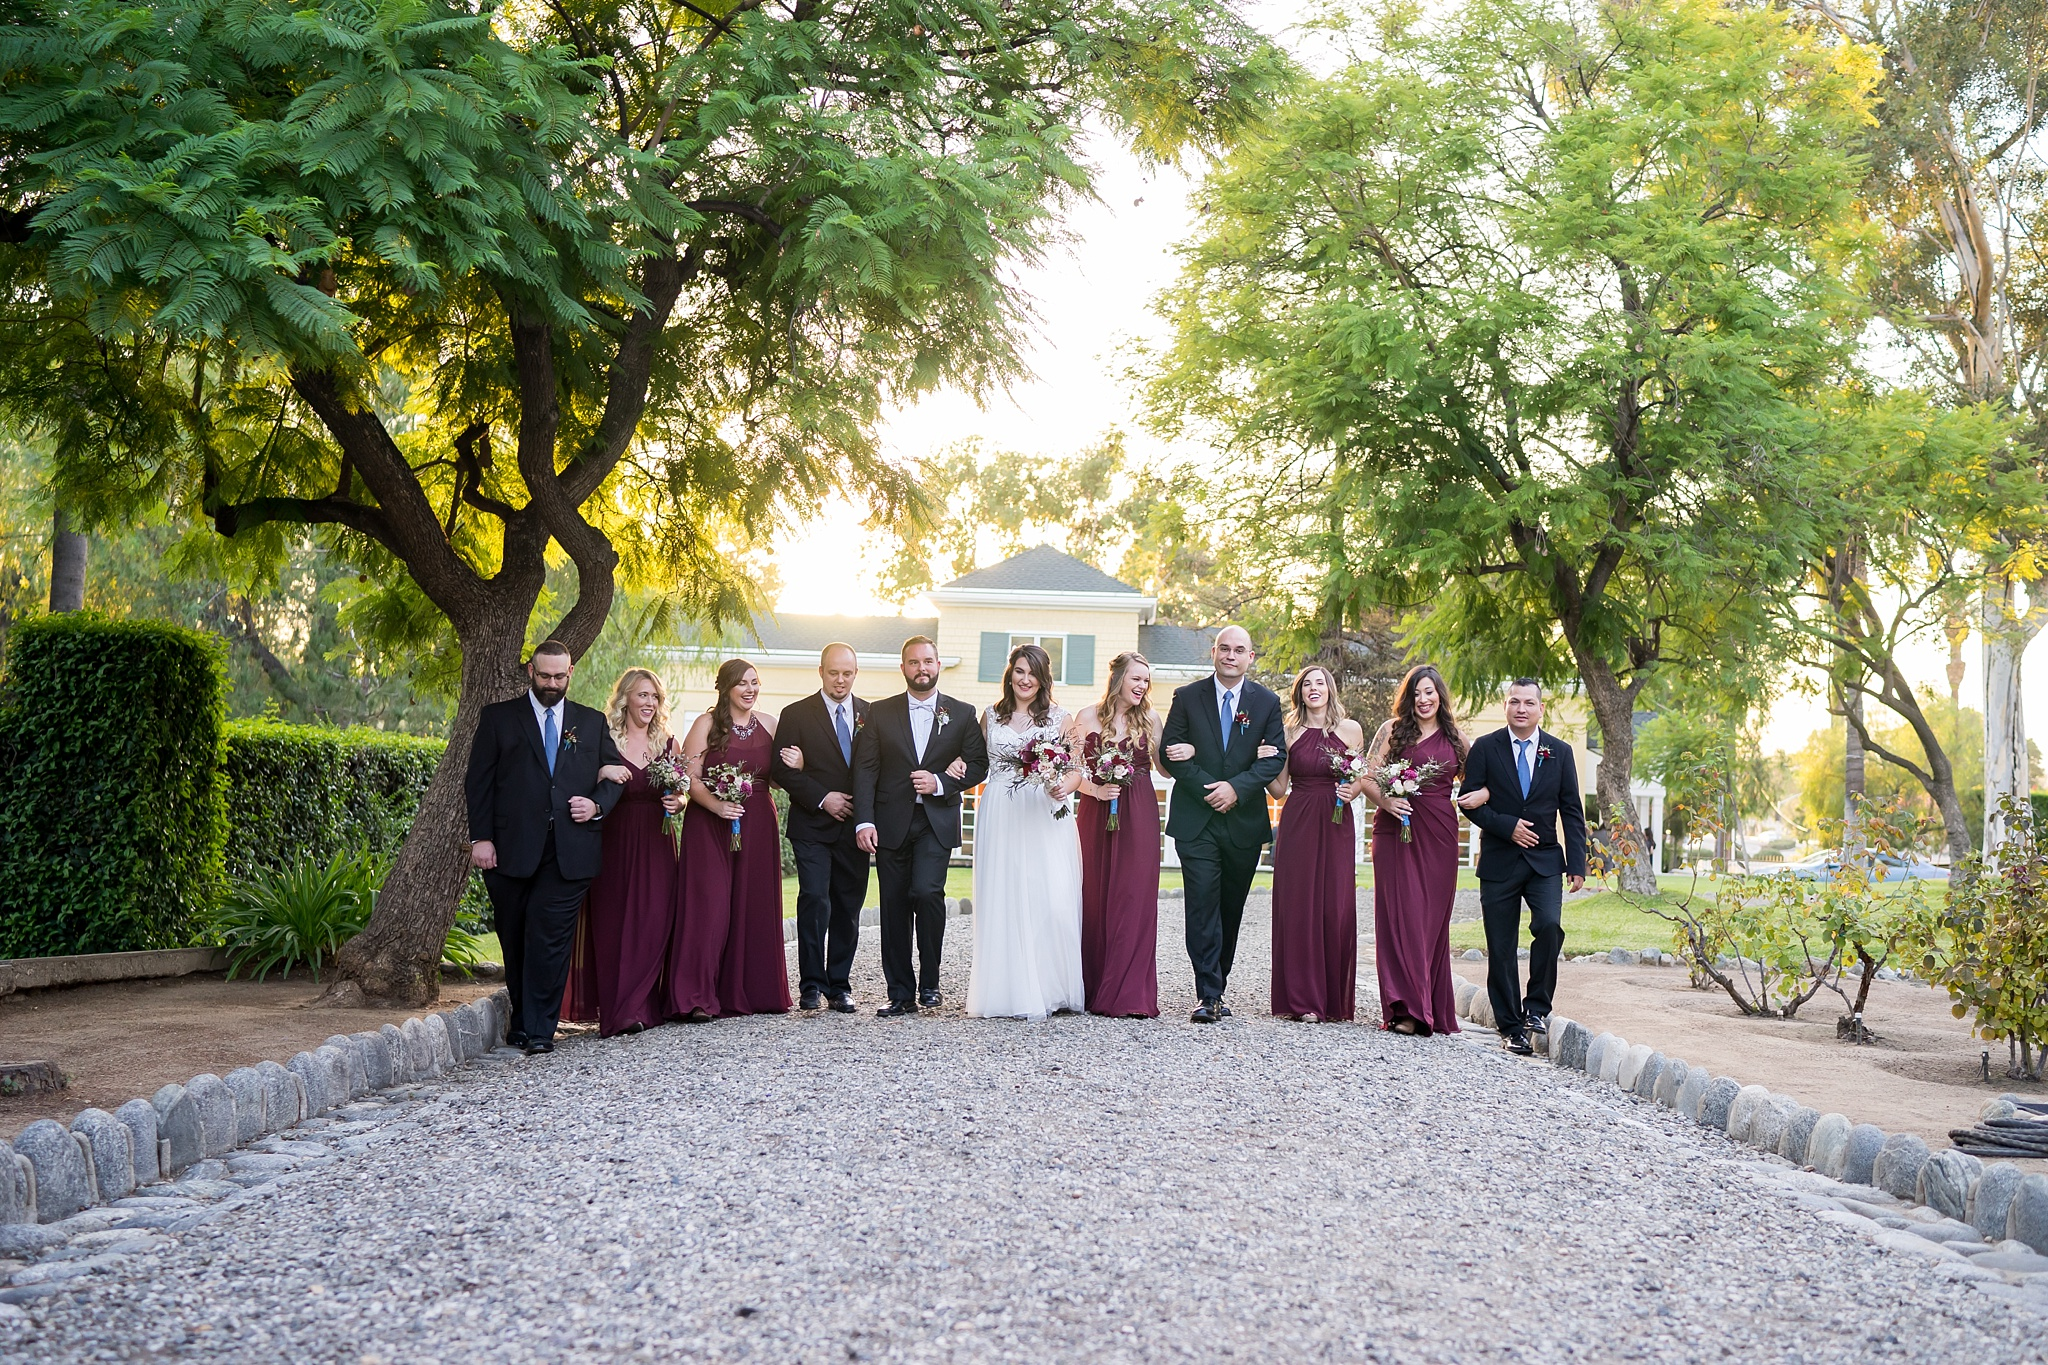 TommyandAmanda_WEDDING_BrienneMichelle_WeddingParty_09_BLOG.jpg